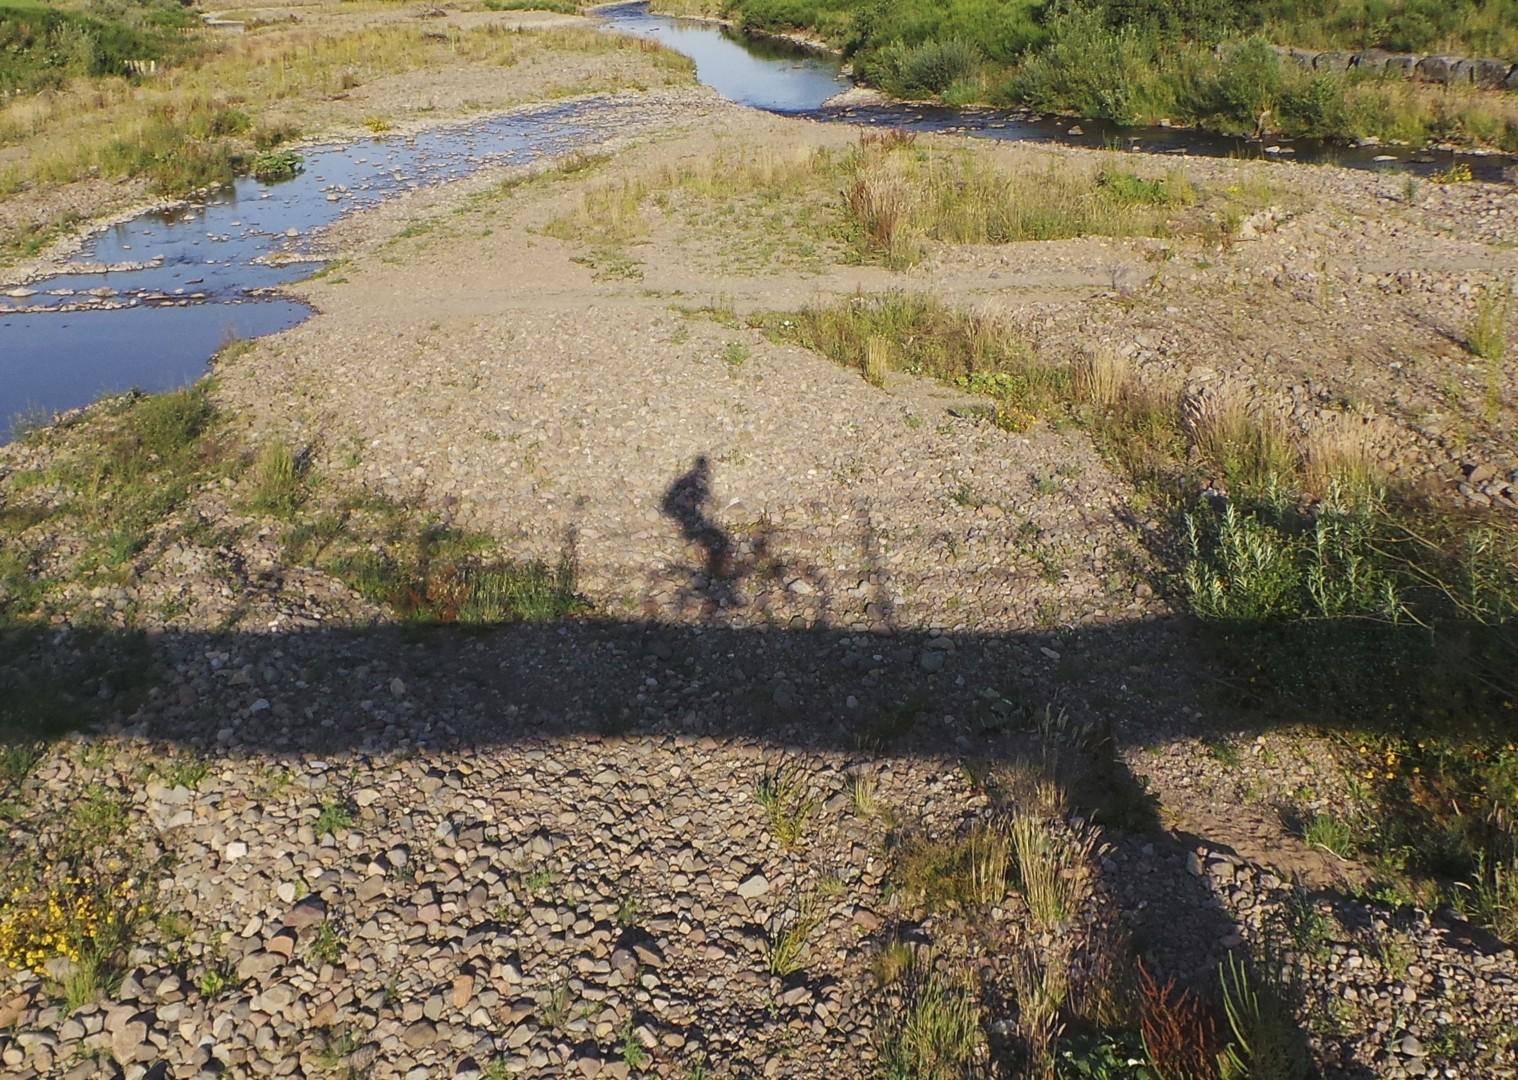 Standstoneway8.jpg - UK - Northumberland - Sandstone Way - Self-Guided Mountain Bike Weekend - Mountain Biking